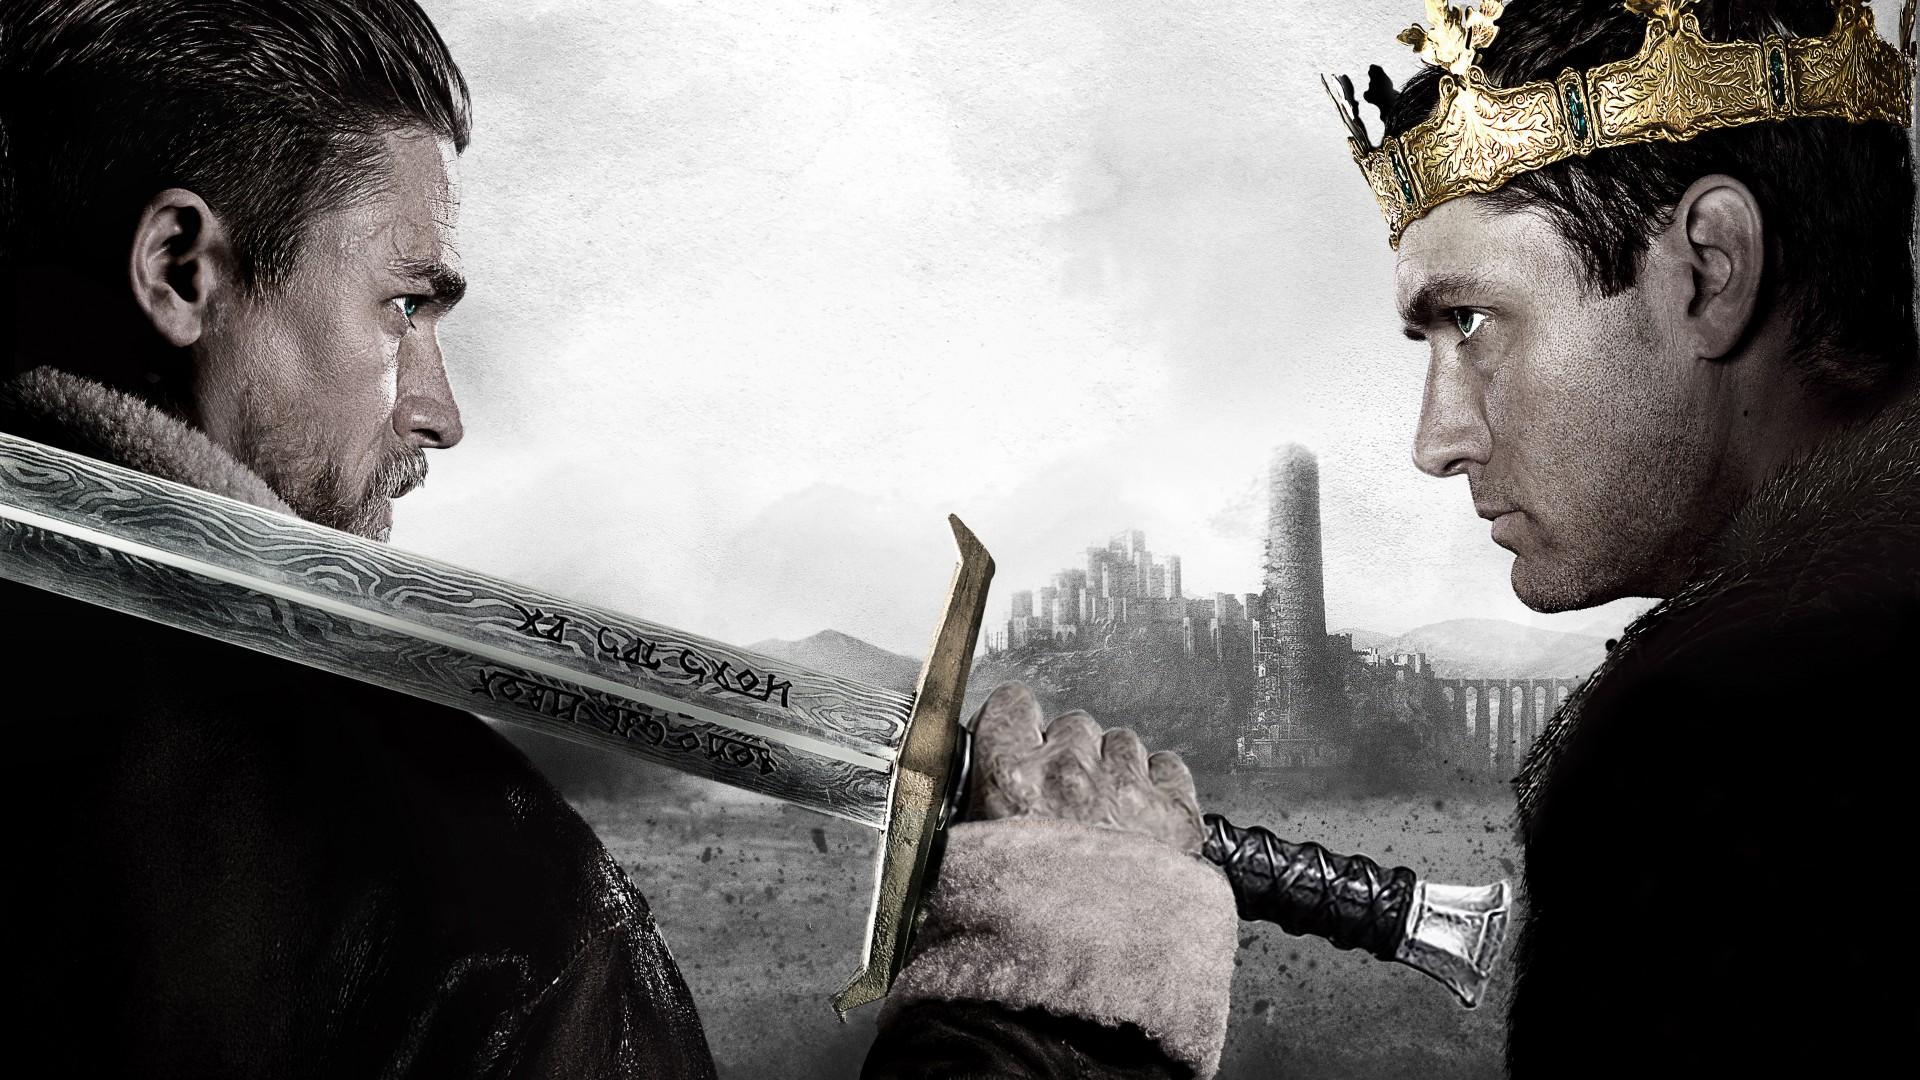 king-arthur-legend-of-the-sword-1920x1080-jude-law-charlie-hunnam-7244_2.jpg